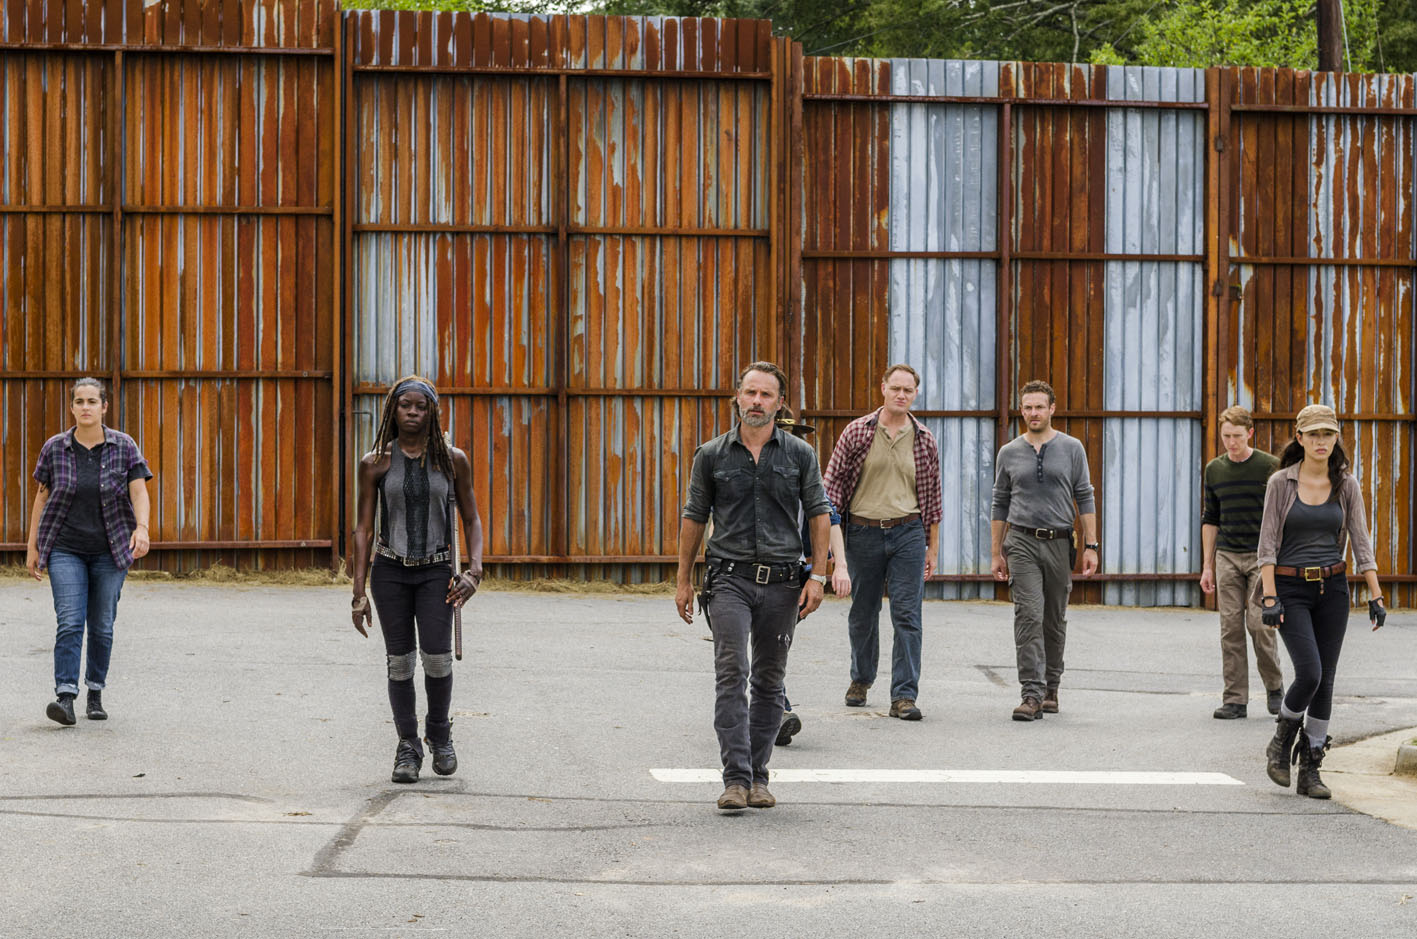 FOX_Premium_-_The_Walking_Dead_-_Temporada_7_Parte_2BA.jpg